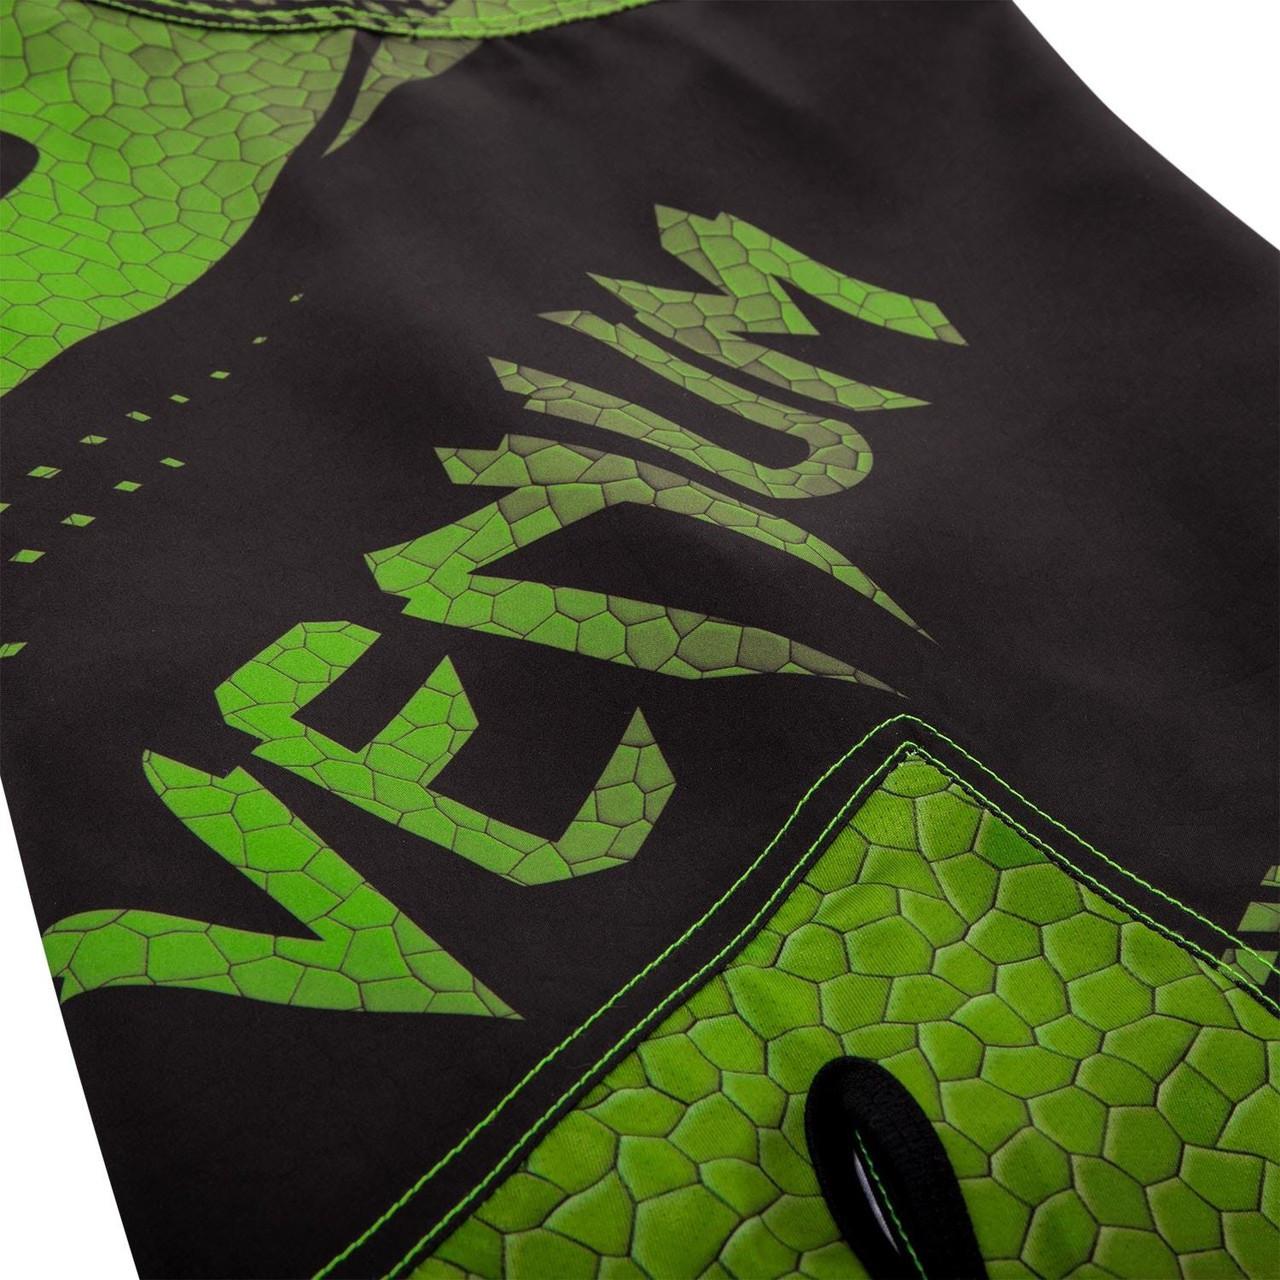 Short legs of the new Venum Hurricane Fightshorts Amazonia Green MMA Shorts now available at www.thejiujitsushop.com  Top MMA and Grappling Shorts  Enjoy Free Shipping from The Jiu Jitsu Shop today!